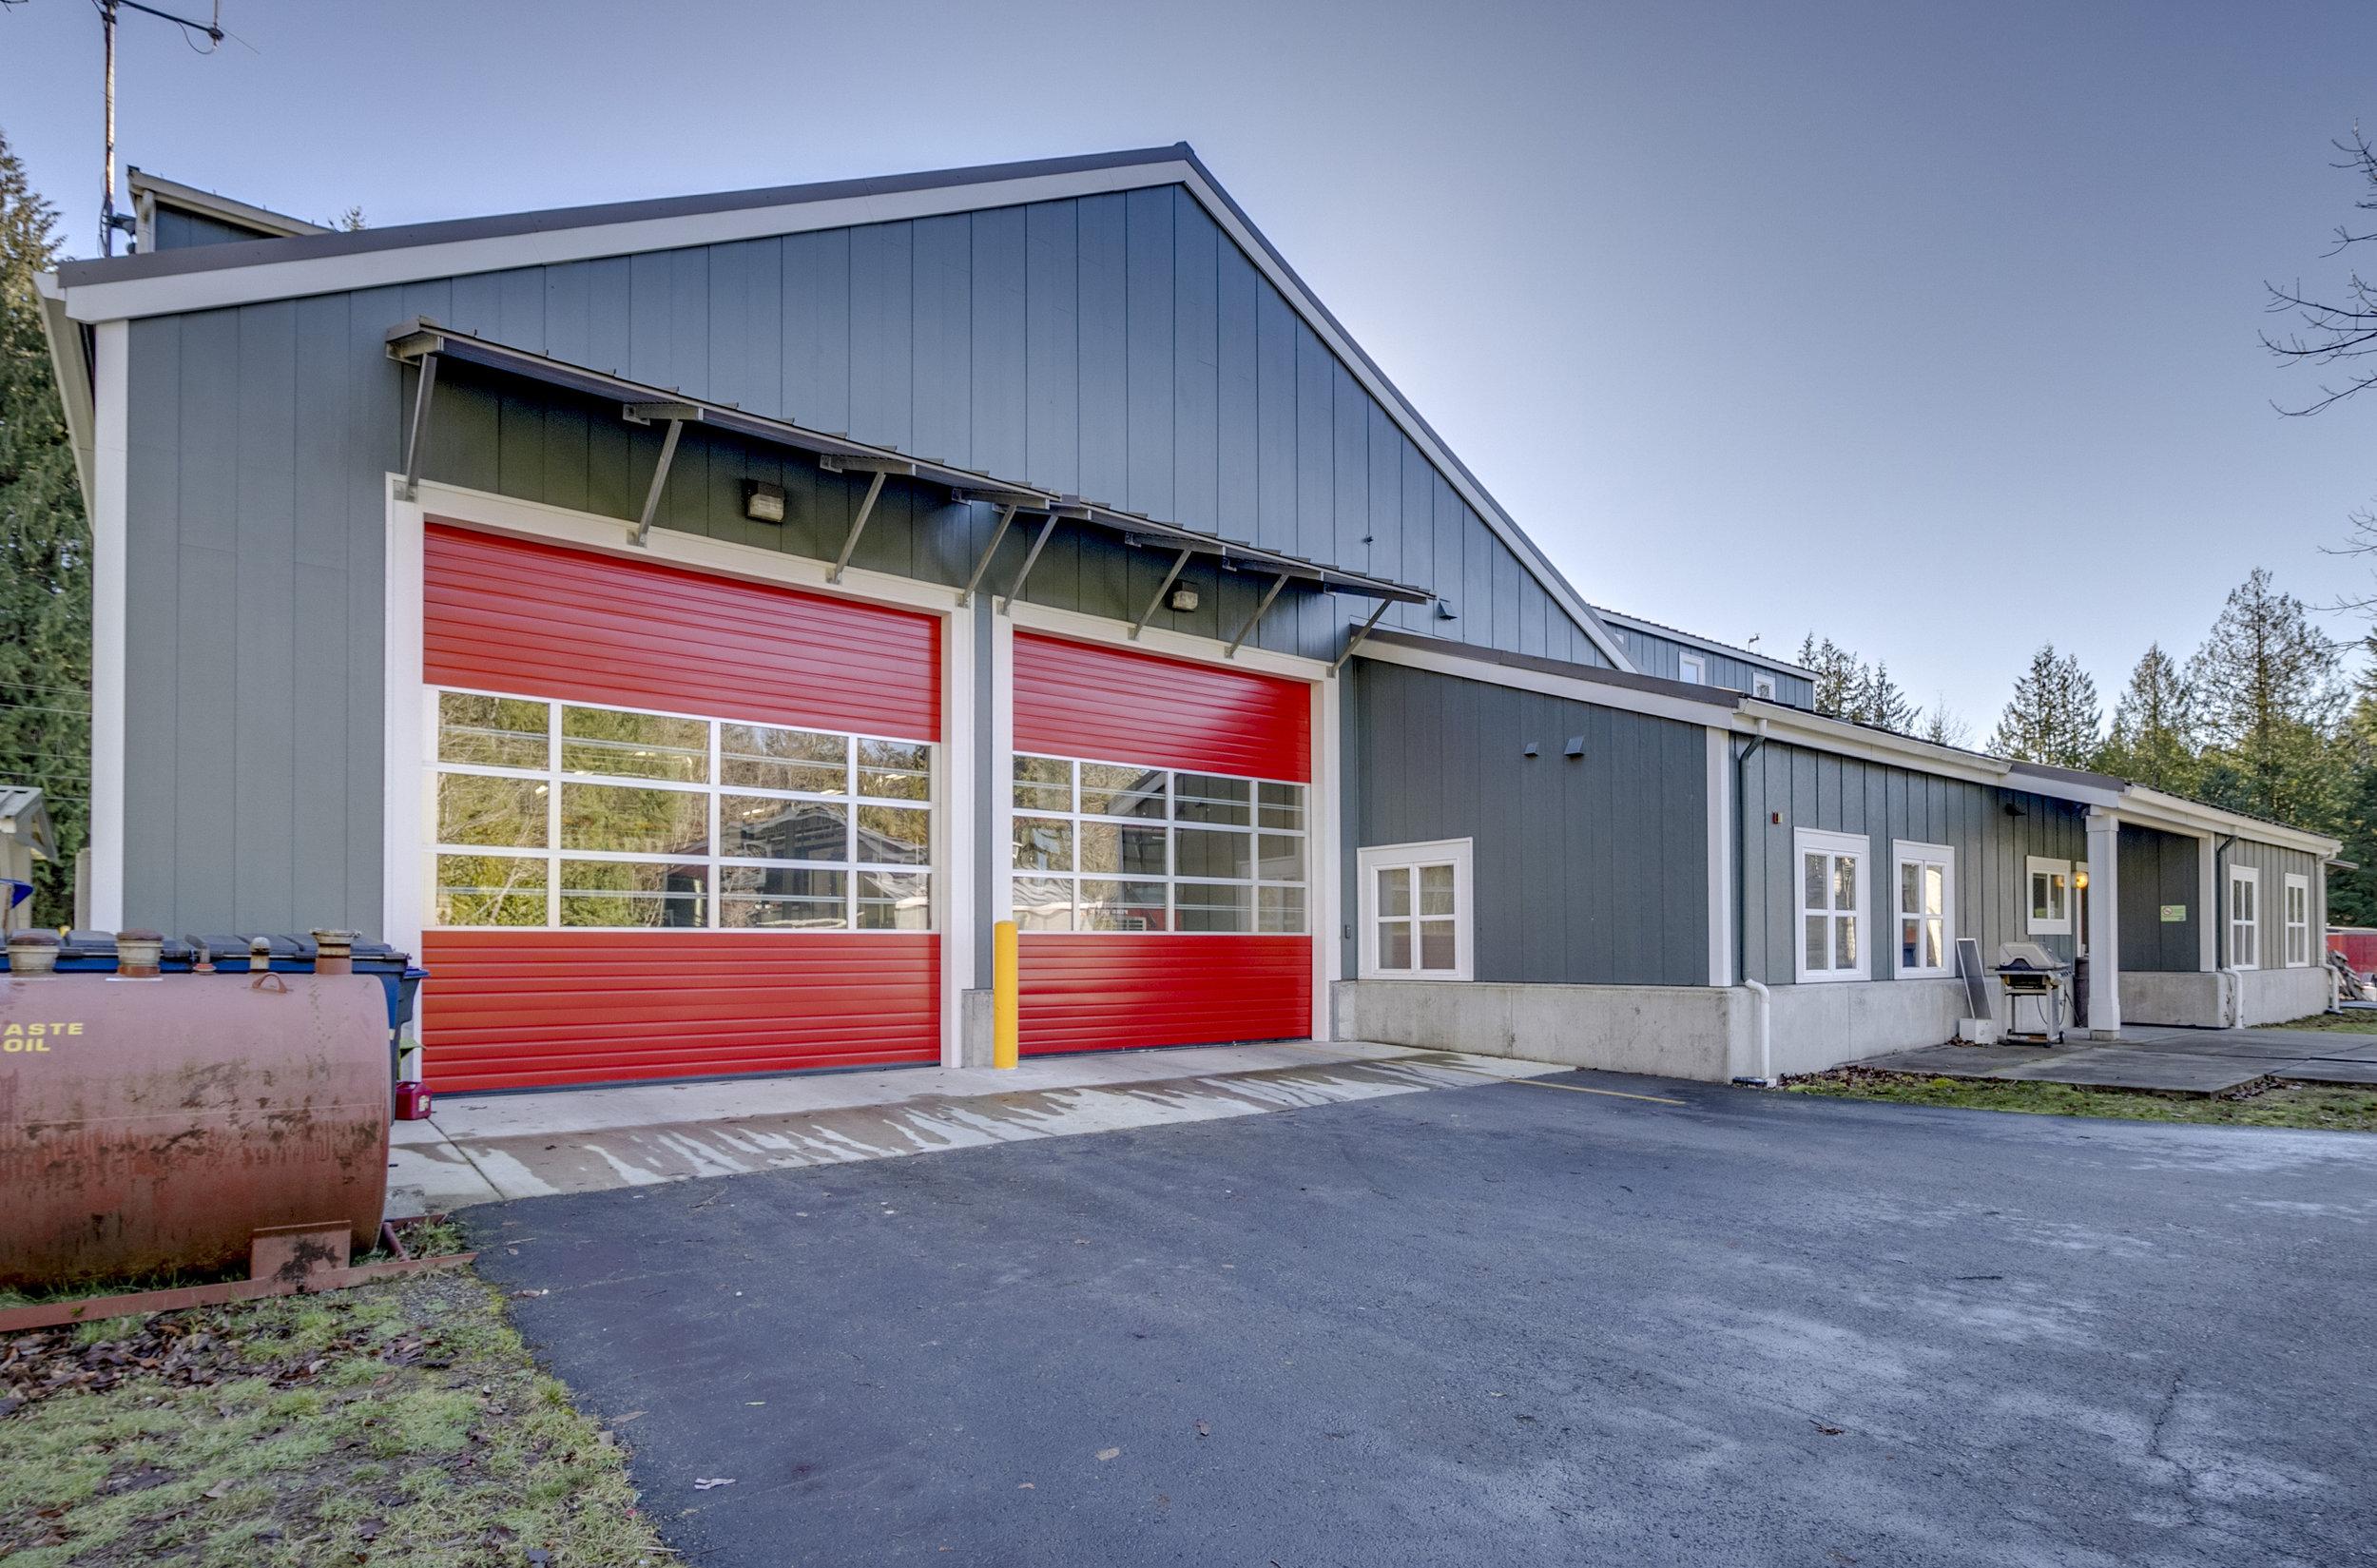 Bainbridge Island Fire Department Station 23 Expansion